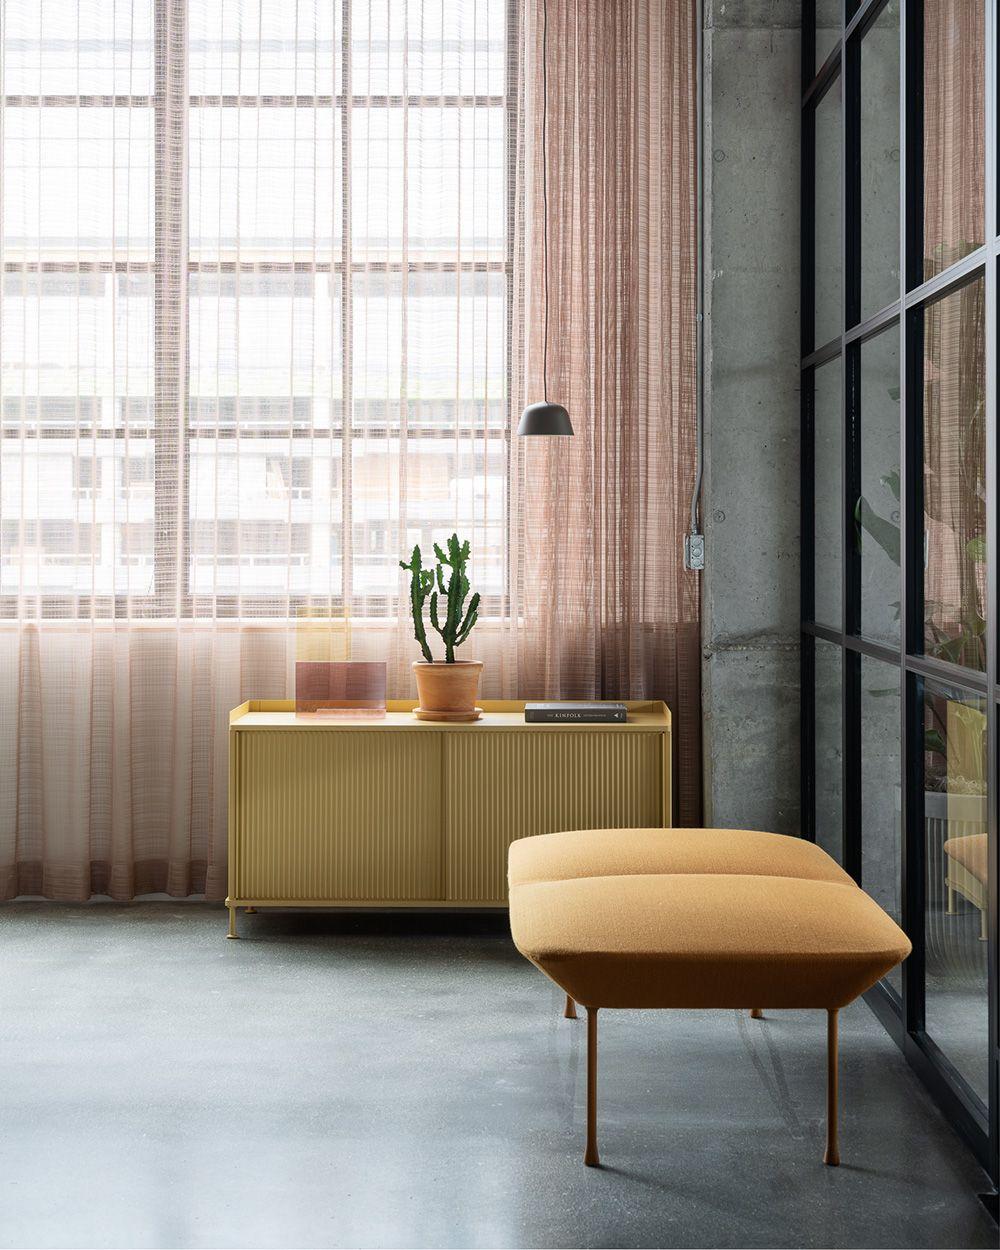 Scandinavian Interior Home Decor Inspiration From Muuto The Oslo Sofa Family Unites Geometric Lines Wi Home Decor Inspiration Decorating A New Home Home Decor